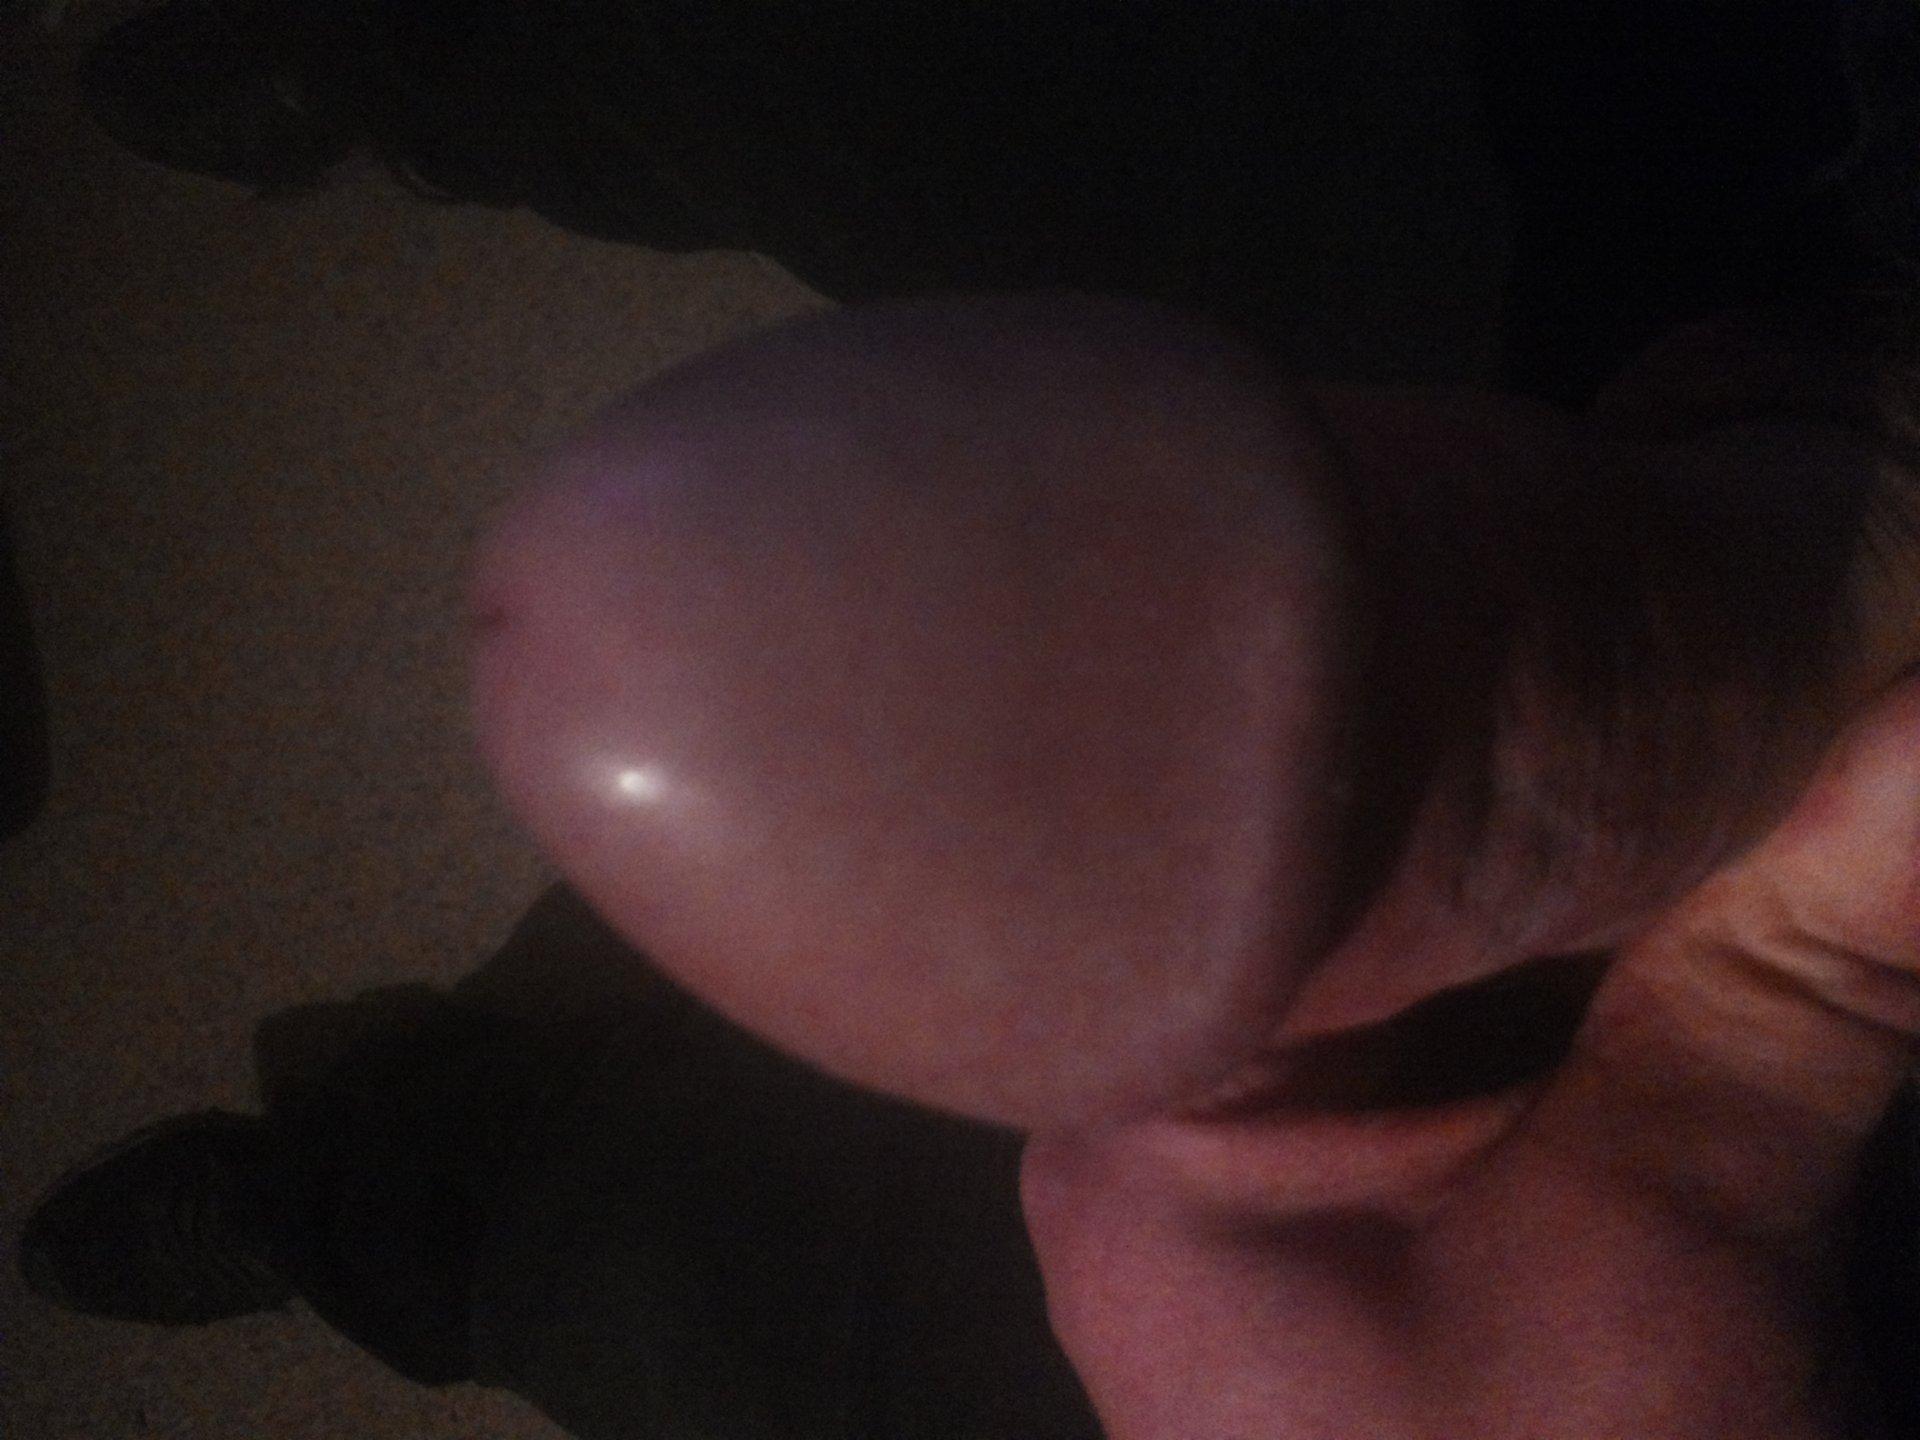 penis will natte kutje 3 uit Gelderland,Nederland